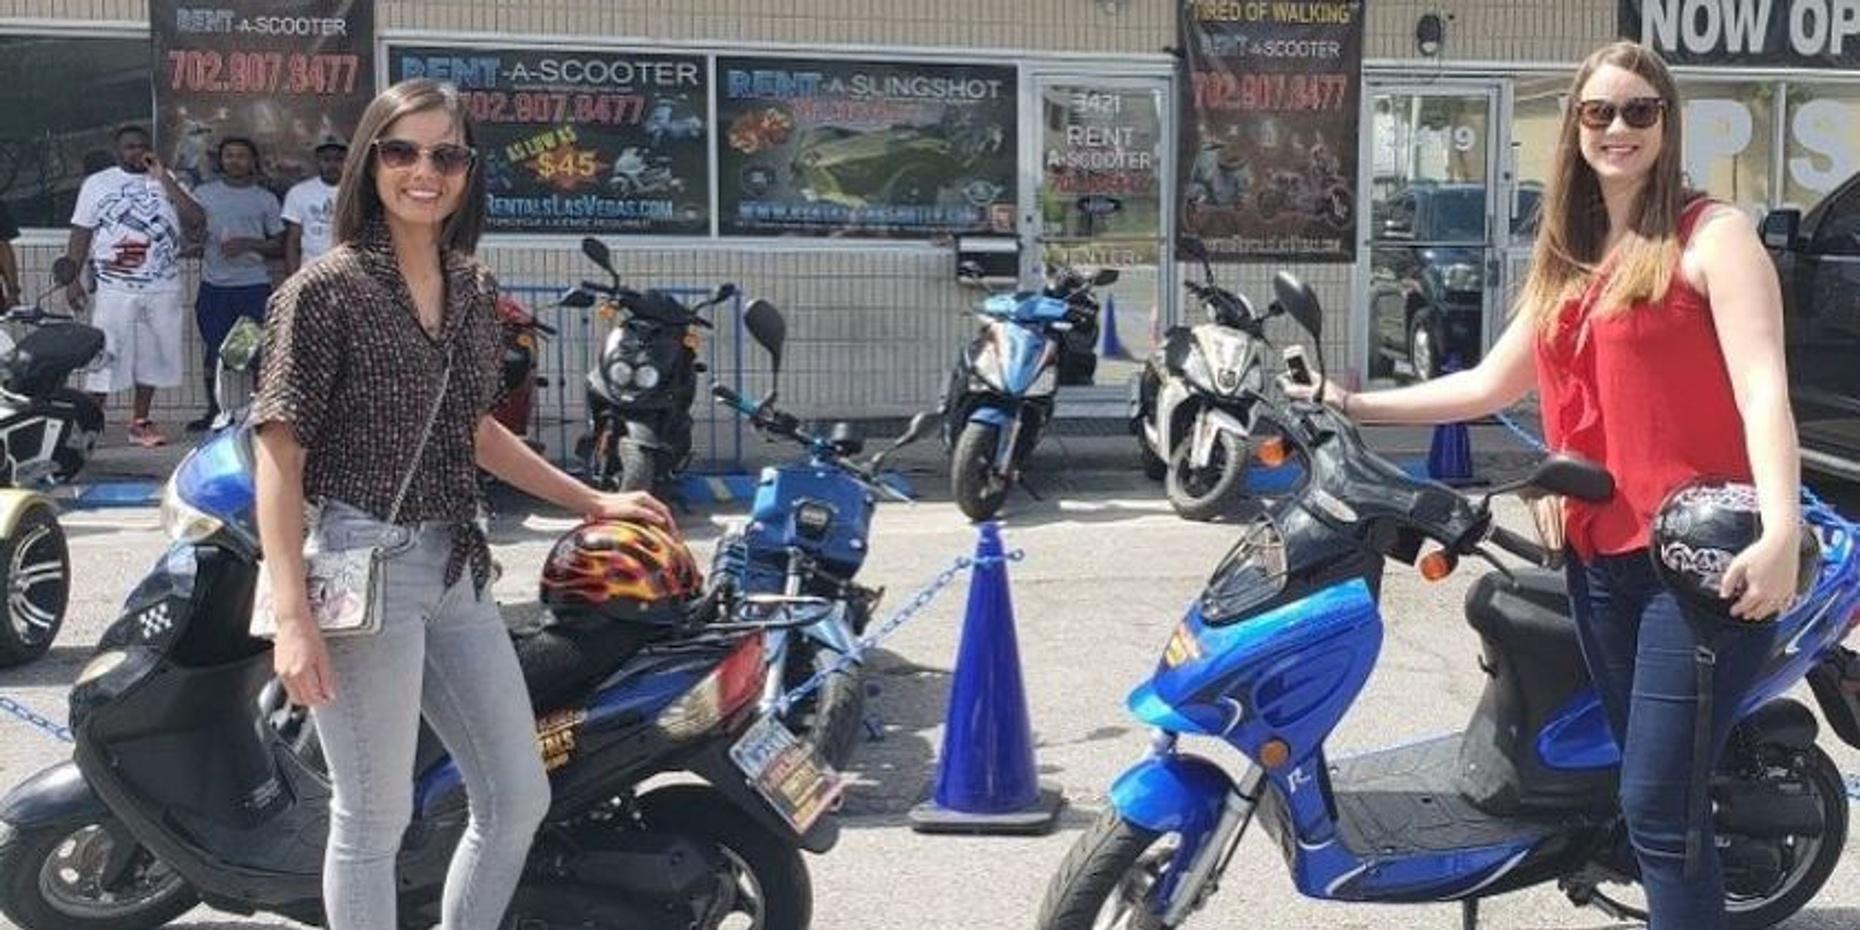 Premium Scooter Rental in Las Vegas